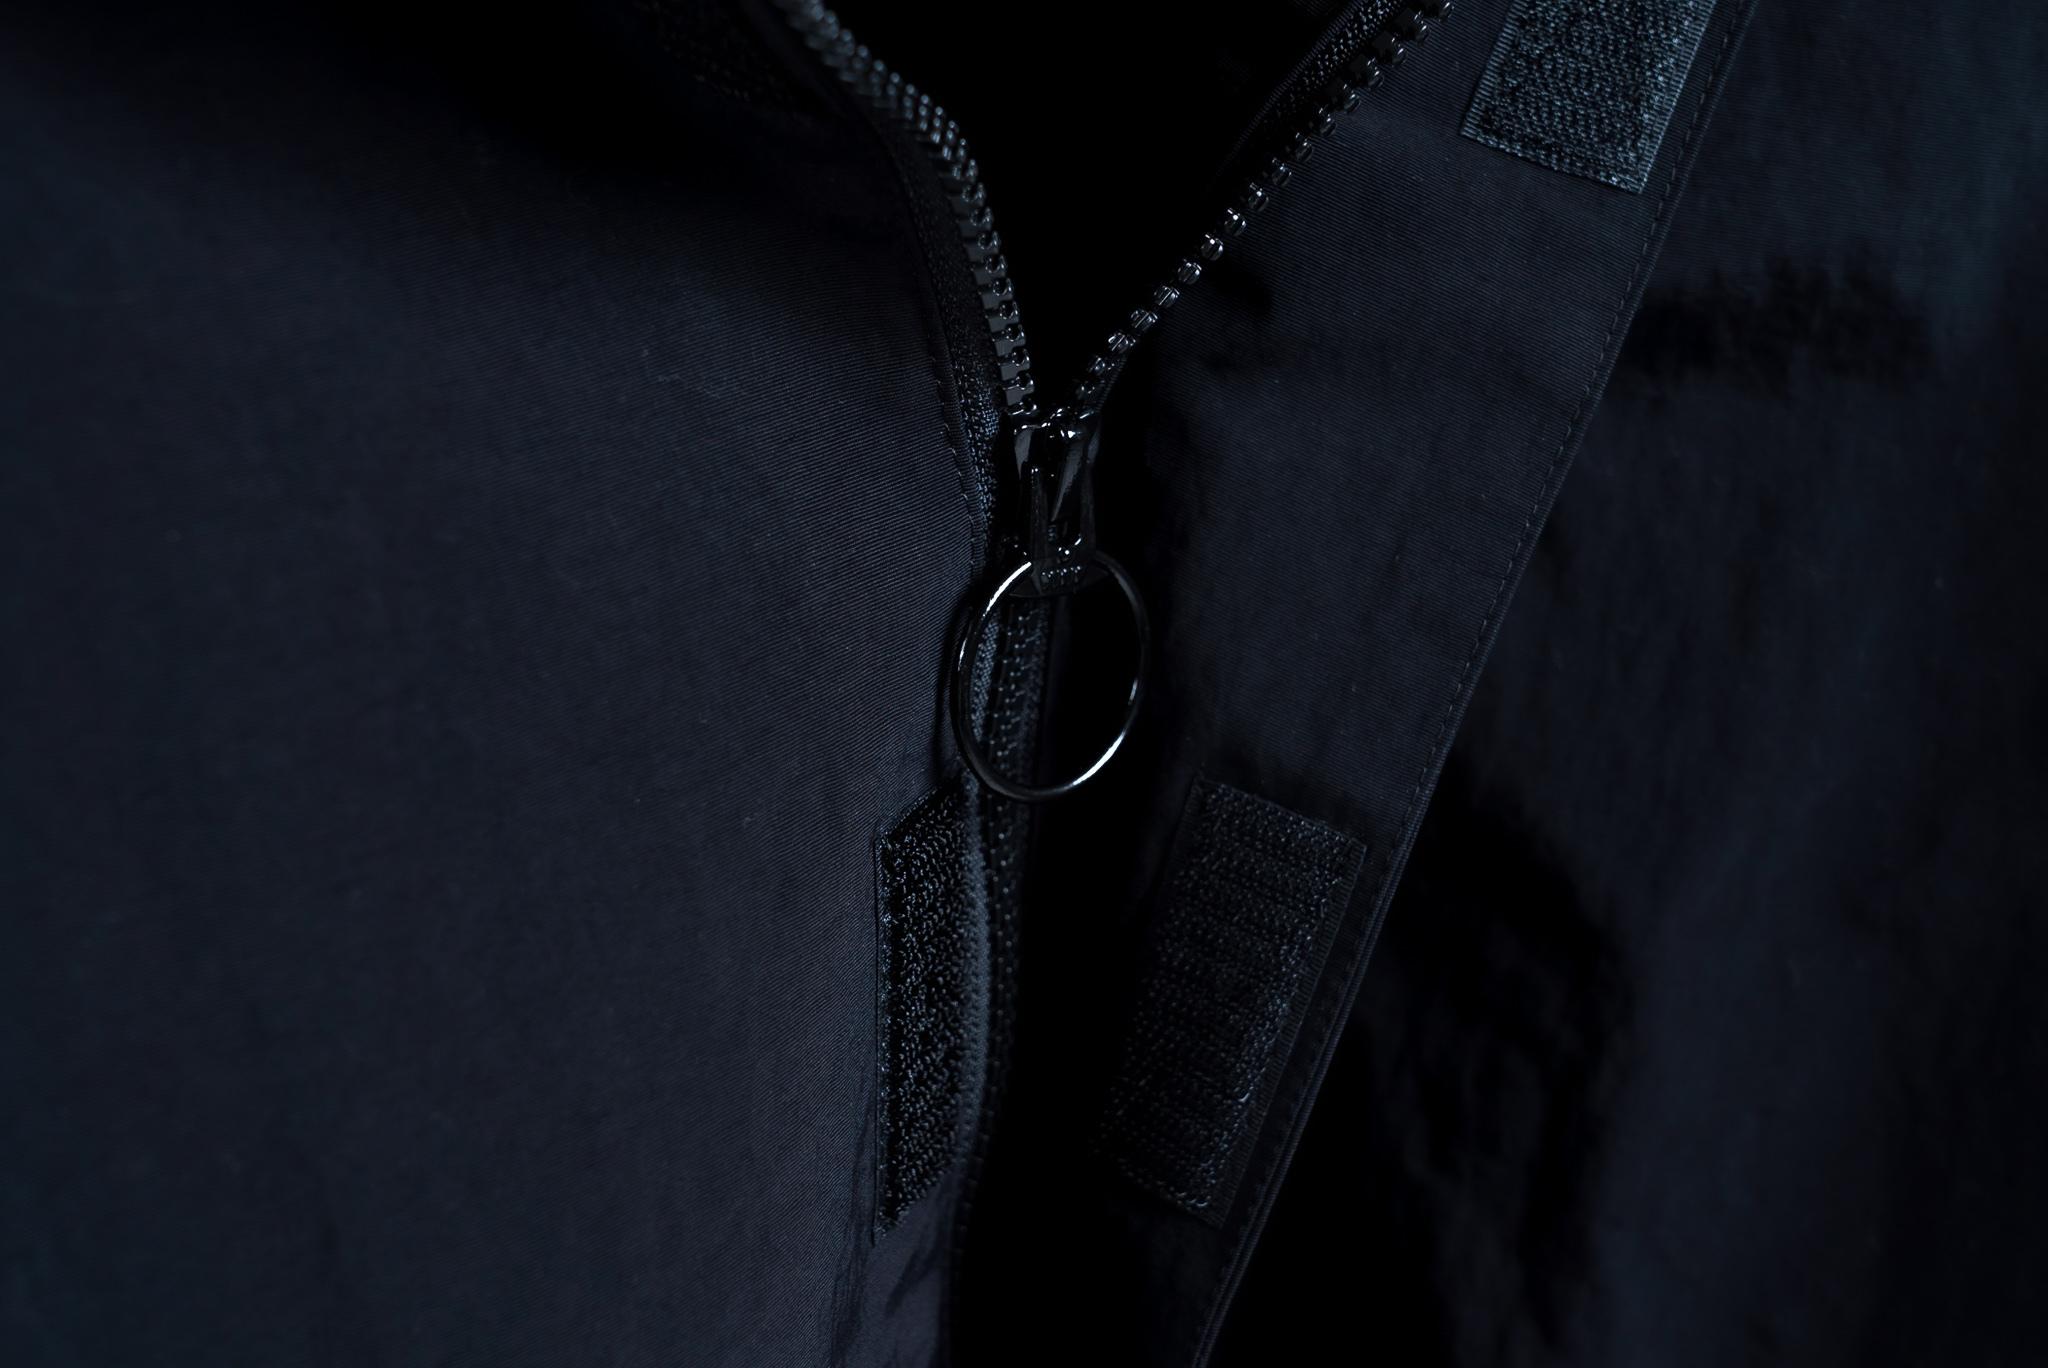 BLAZZ Anorak / Made in JAPAN -BLACK x PINK-